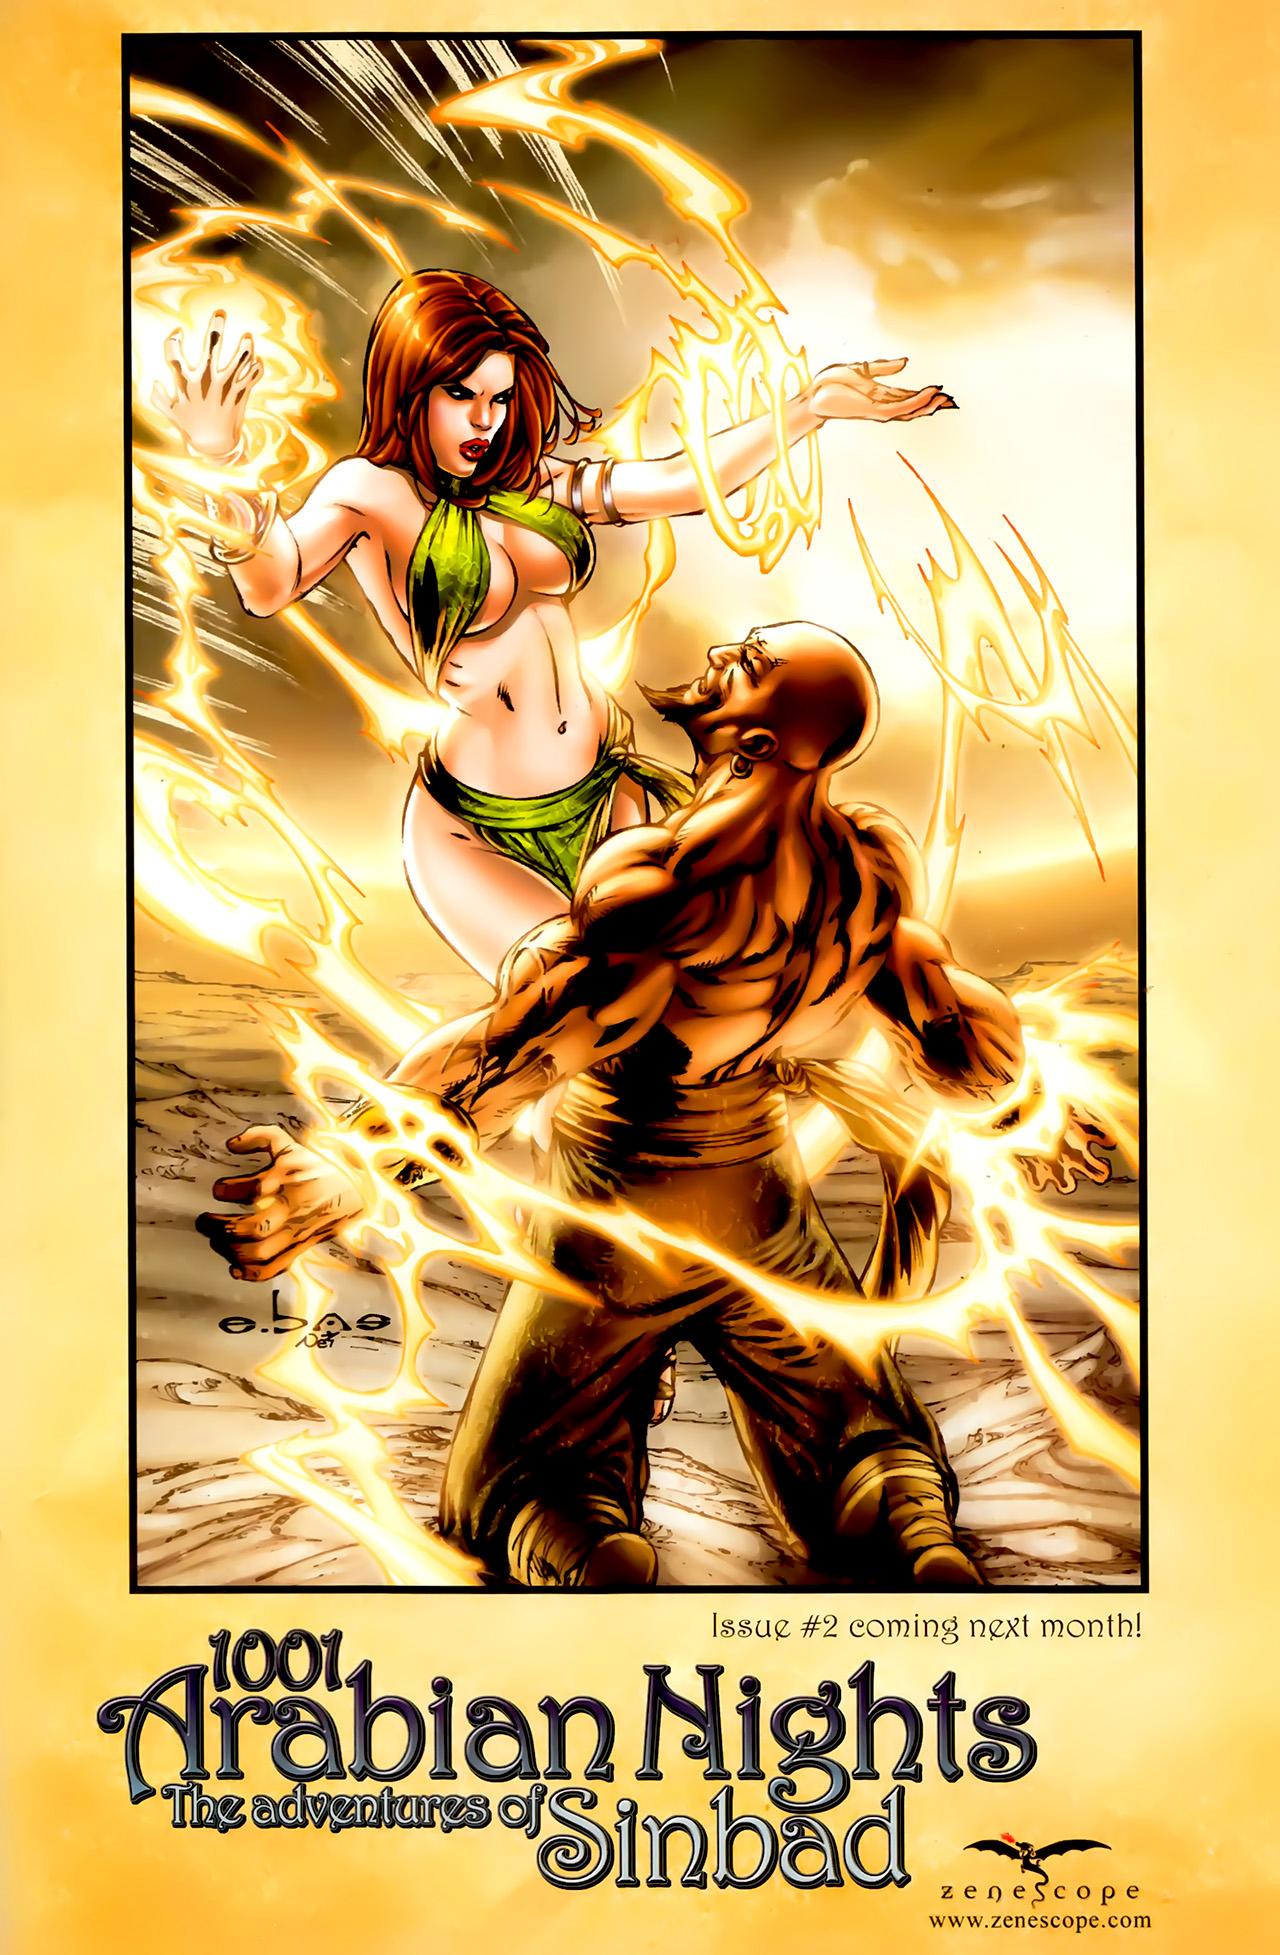 Read online 1001 Arabian Nights: The Adventures of Sinbad comic -  Issue #1 - 28